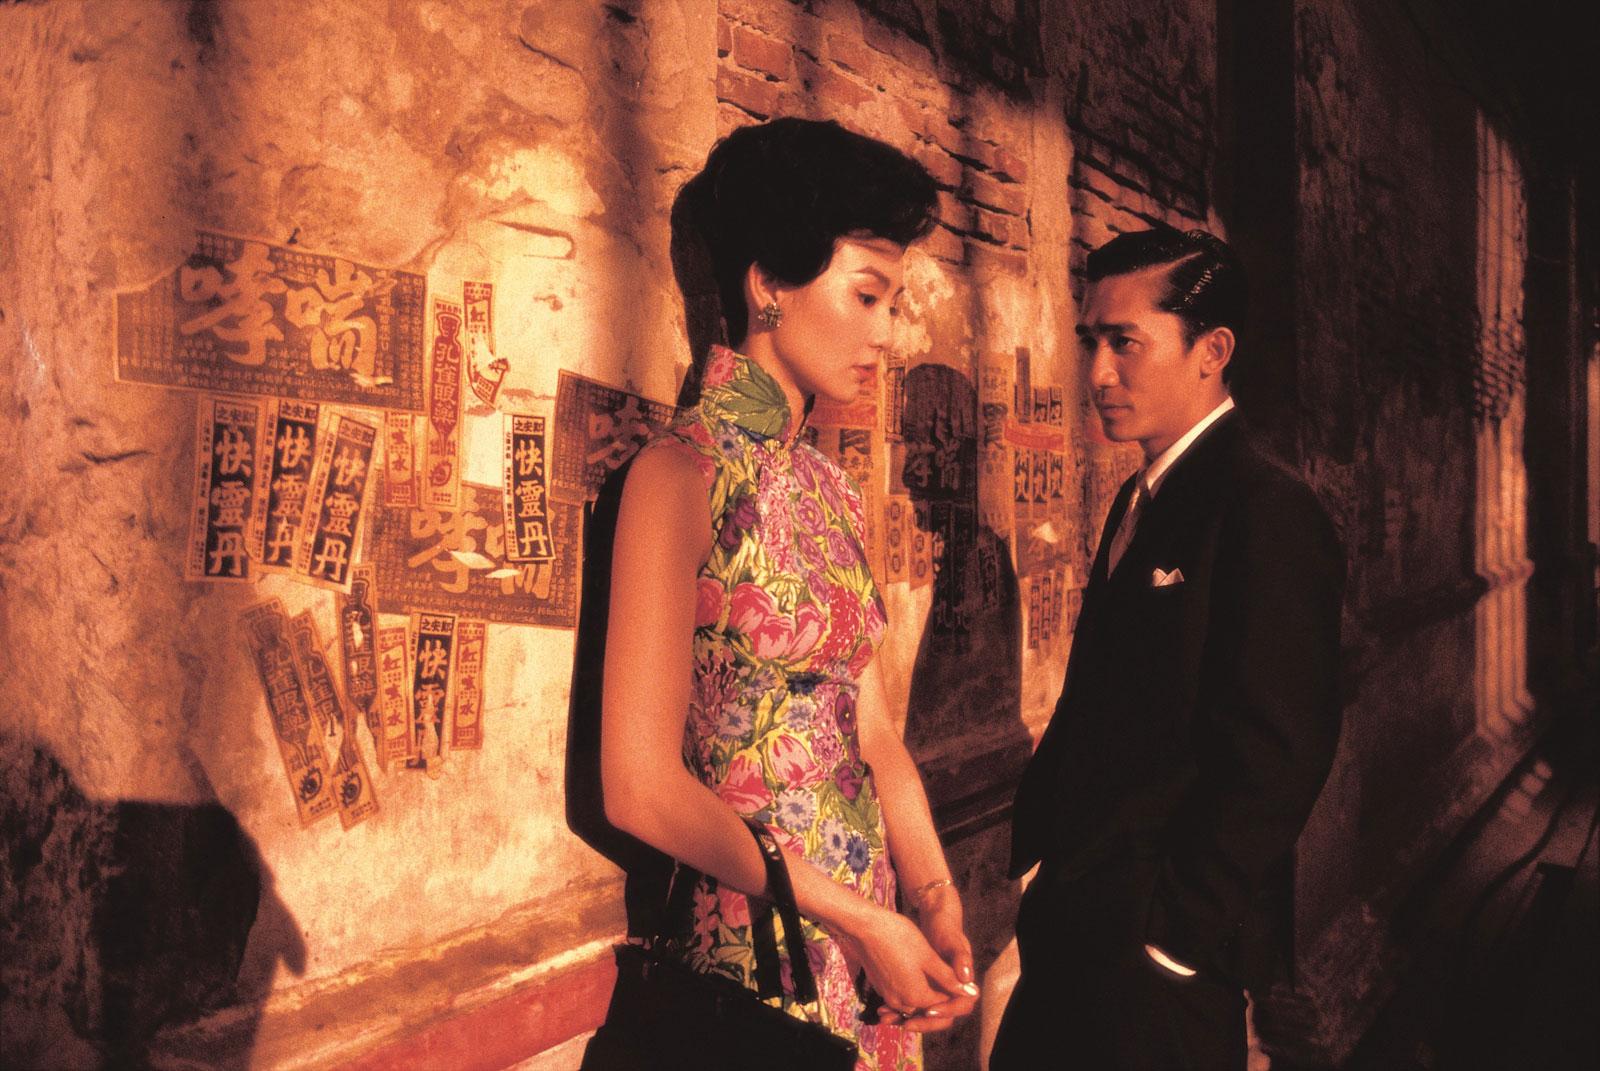 Любовное настроение (Fa yeung nin wah, 2000